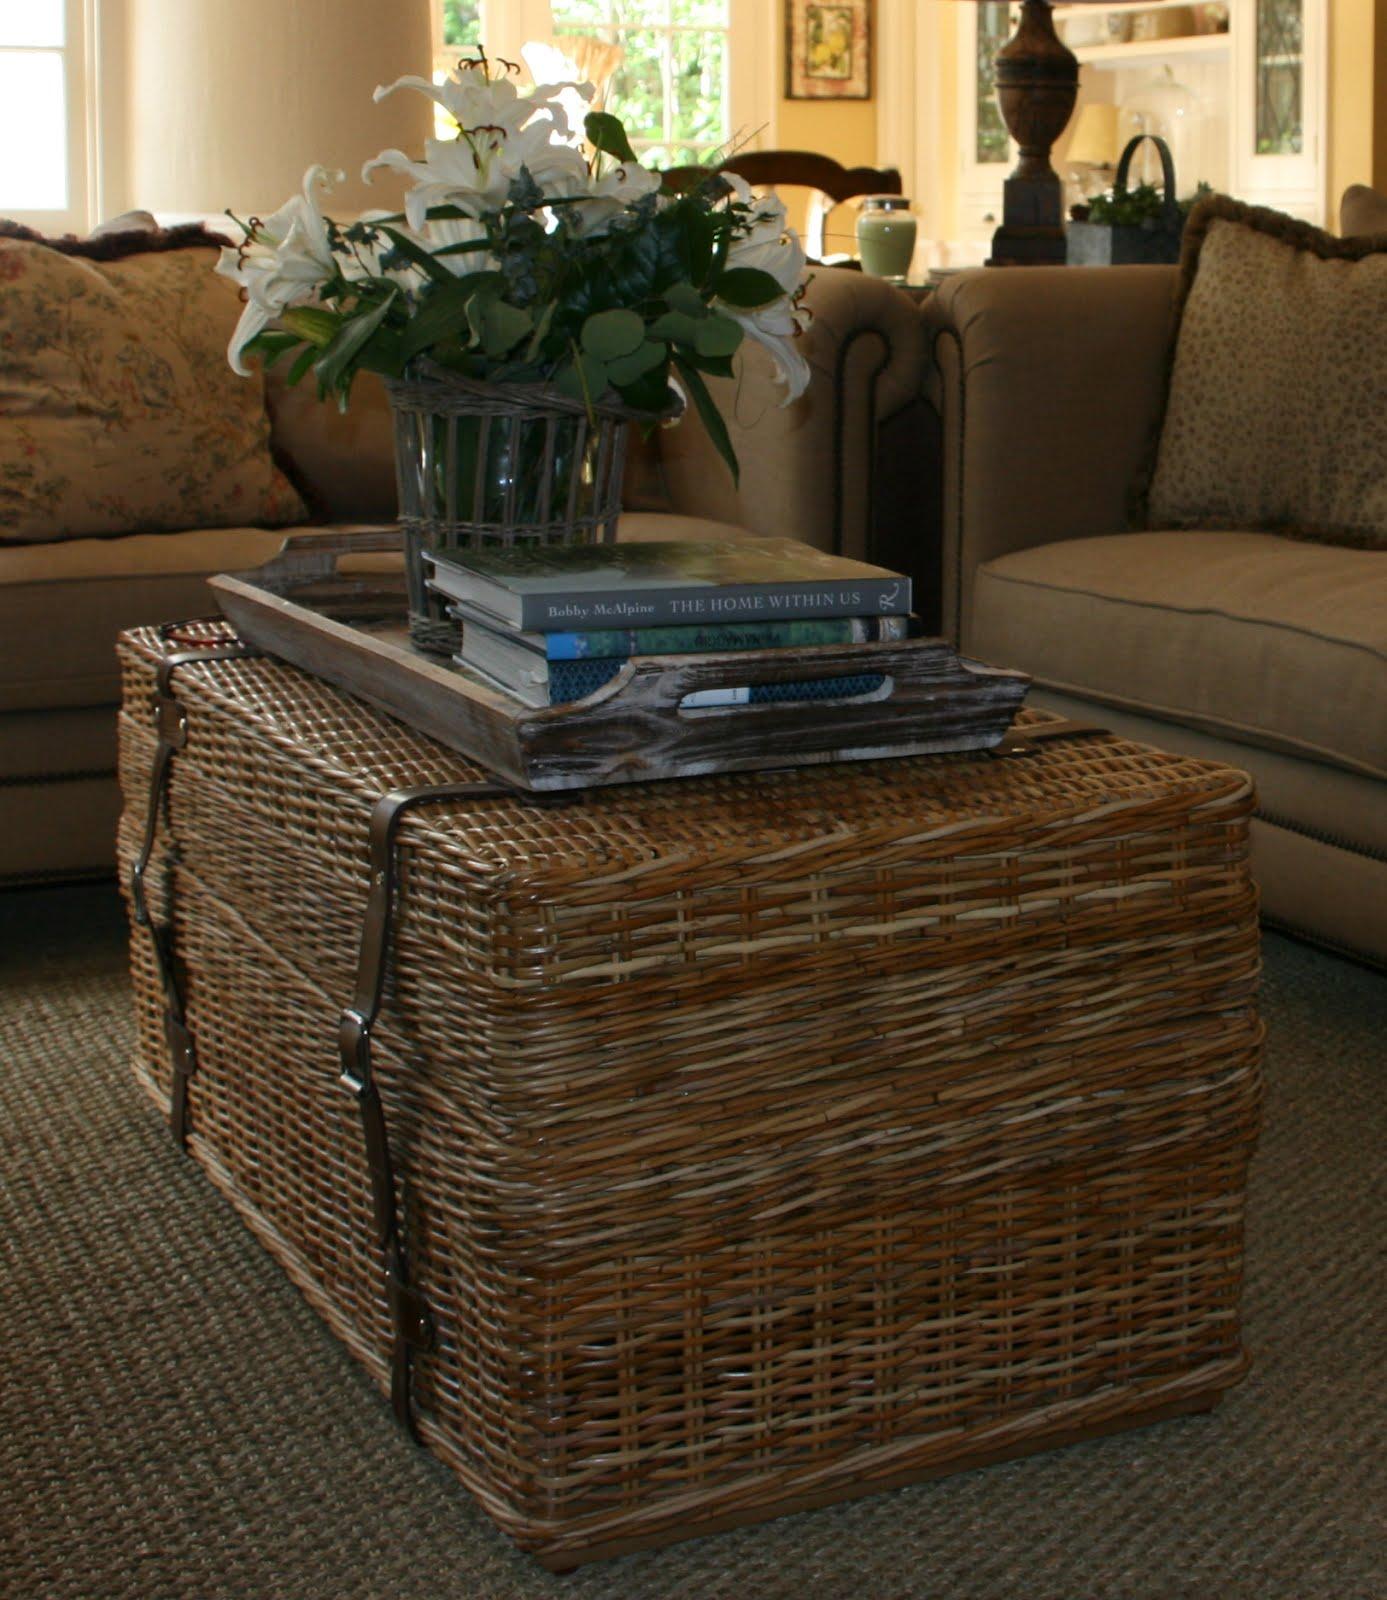 Wicker Storage Chest Coffee Table: Vignette Design: Warm, Wonderful, Woven Wicker